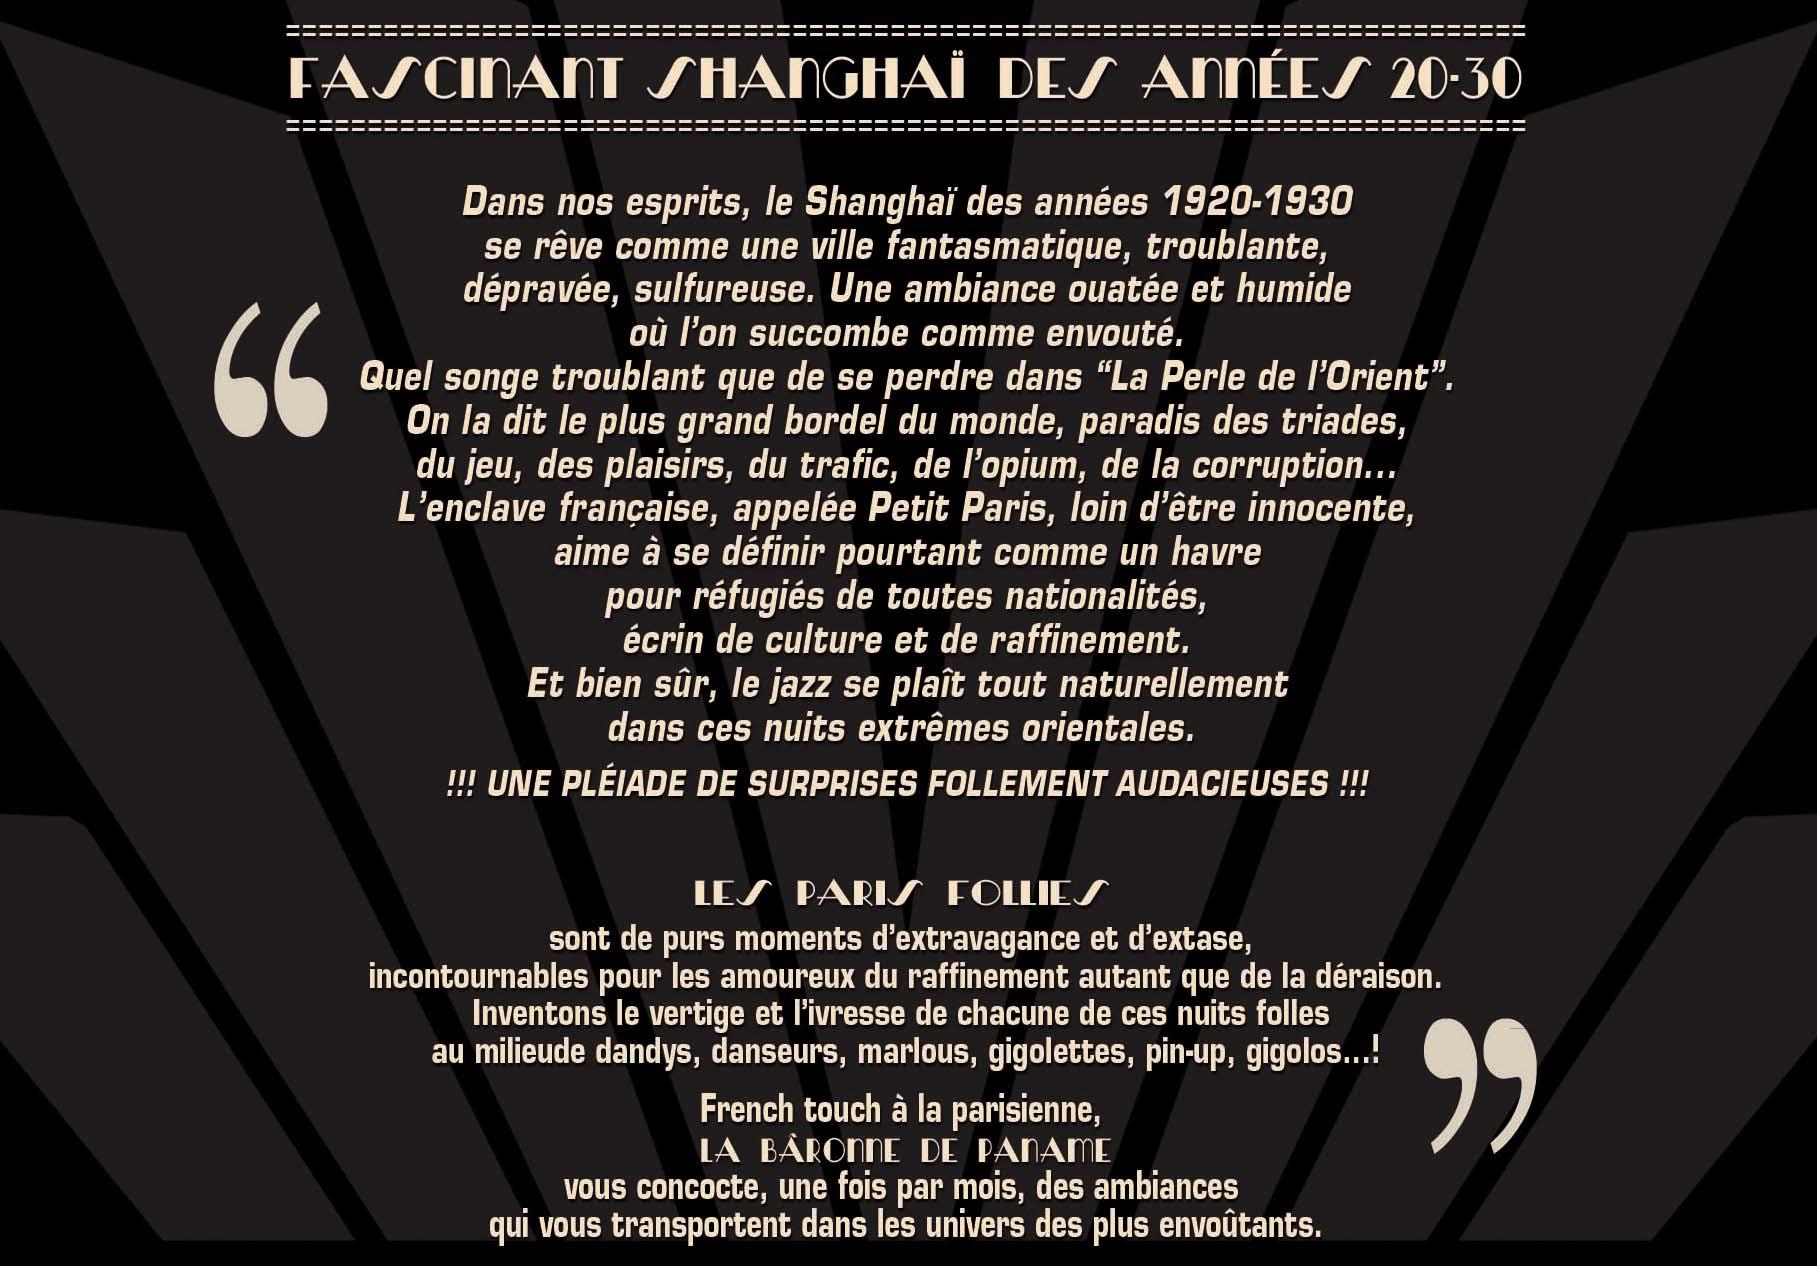 PARIS FOLLIES DE NOVEMBRE